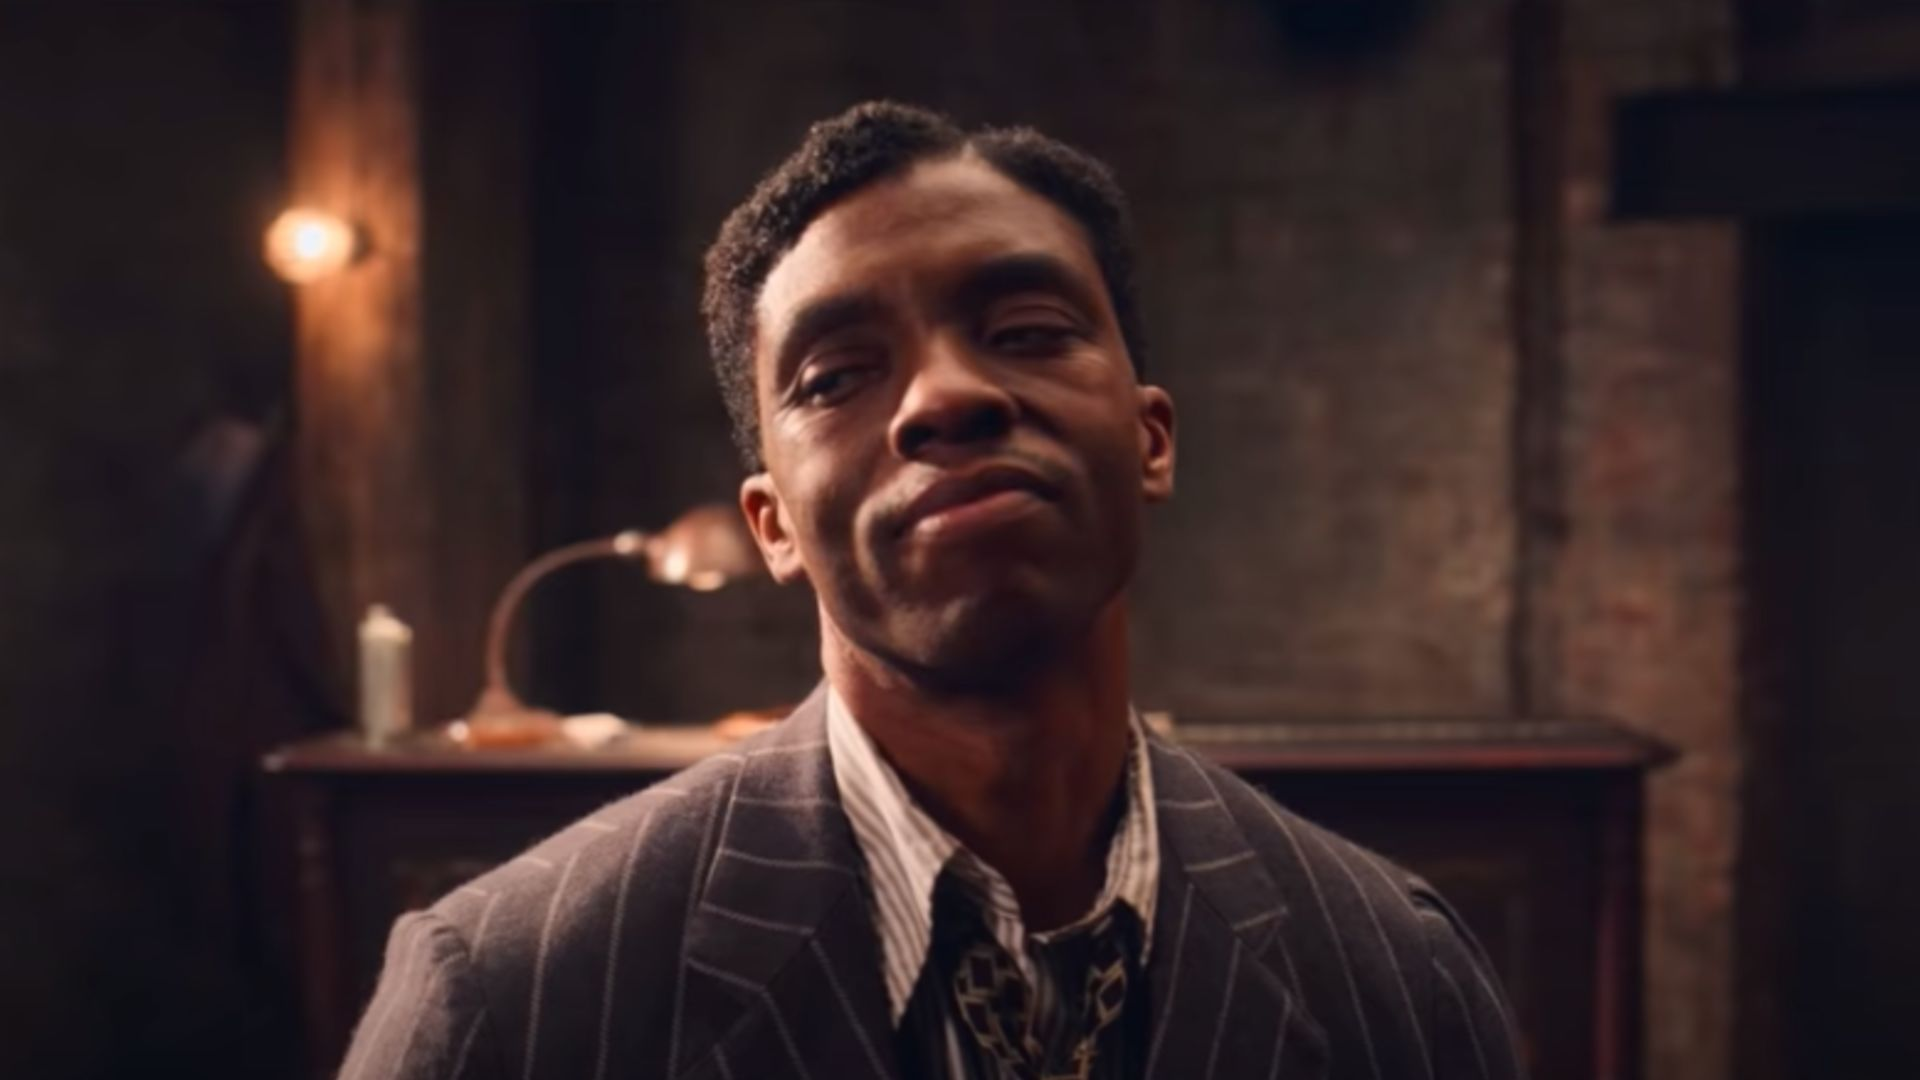 Trailer 'Ma Rainey's Black Bottom' met Chadwick Boseman online gezet